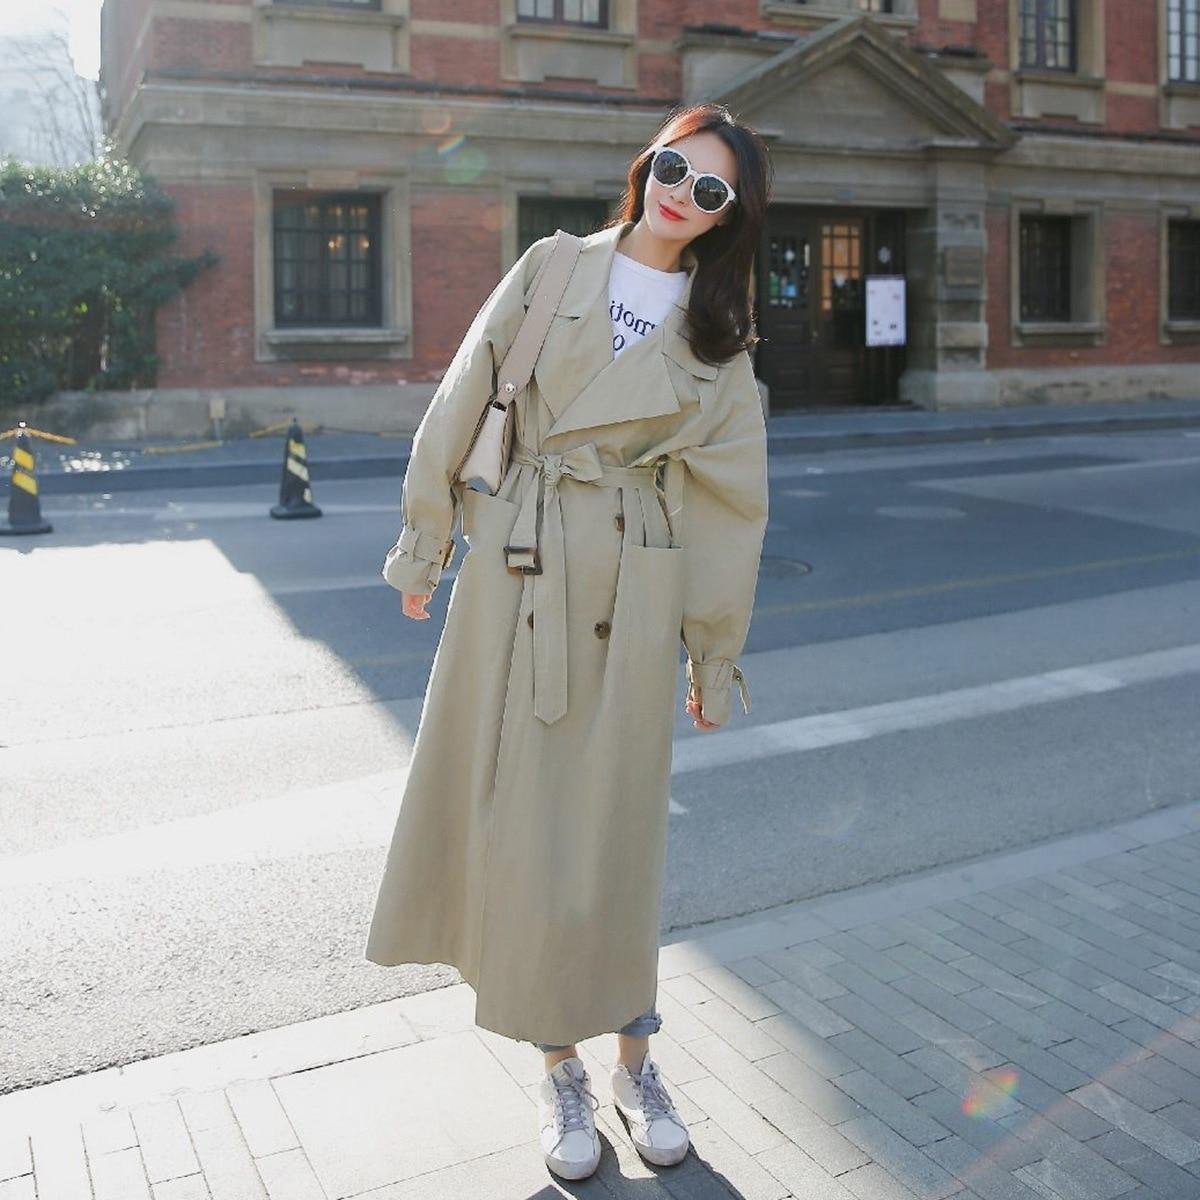 Long Trench Coats Fashion Lady Waist Sashes Outerwear Windbreaker Loose Coat Big Pocket Overknee Trench Women Chic Dust Coat